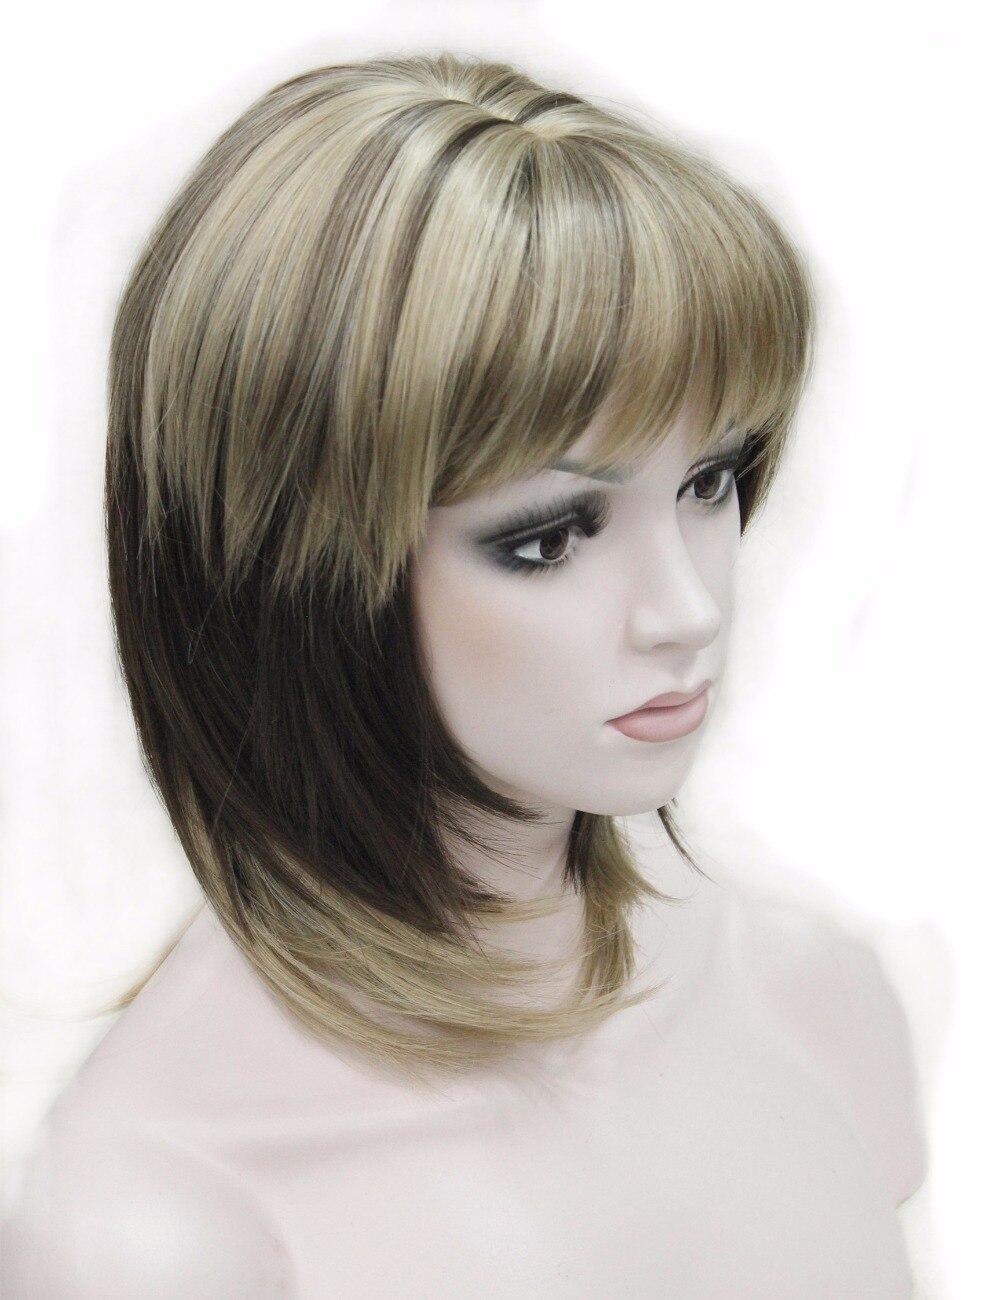 Pelucas sintéticas de belleza fuerte media larga recta Peluca de mujer con flequillo